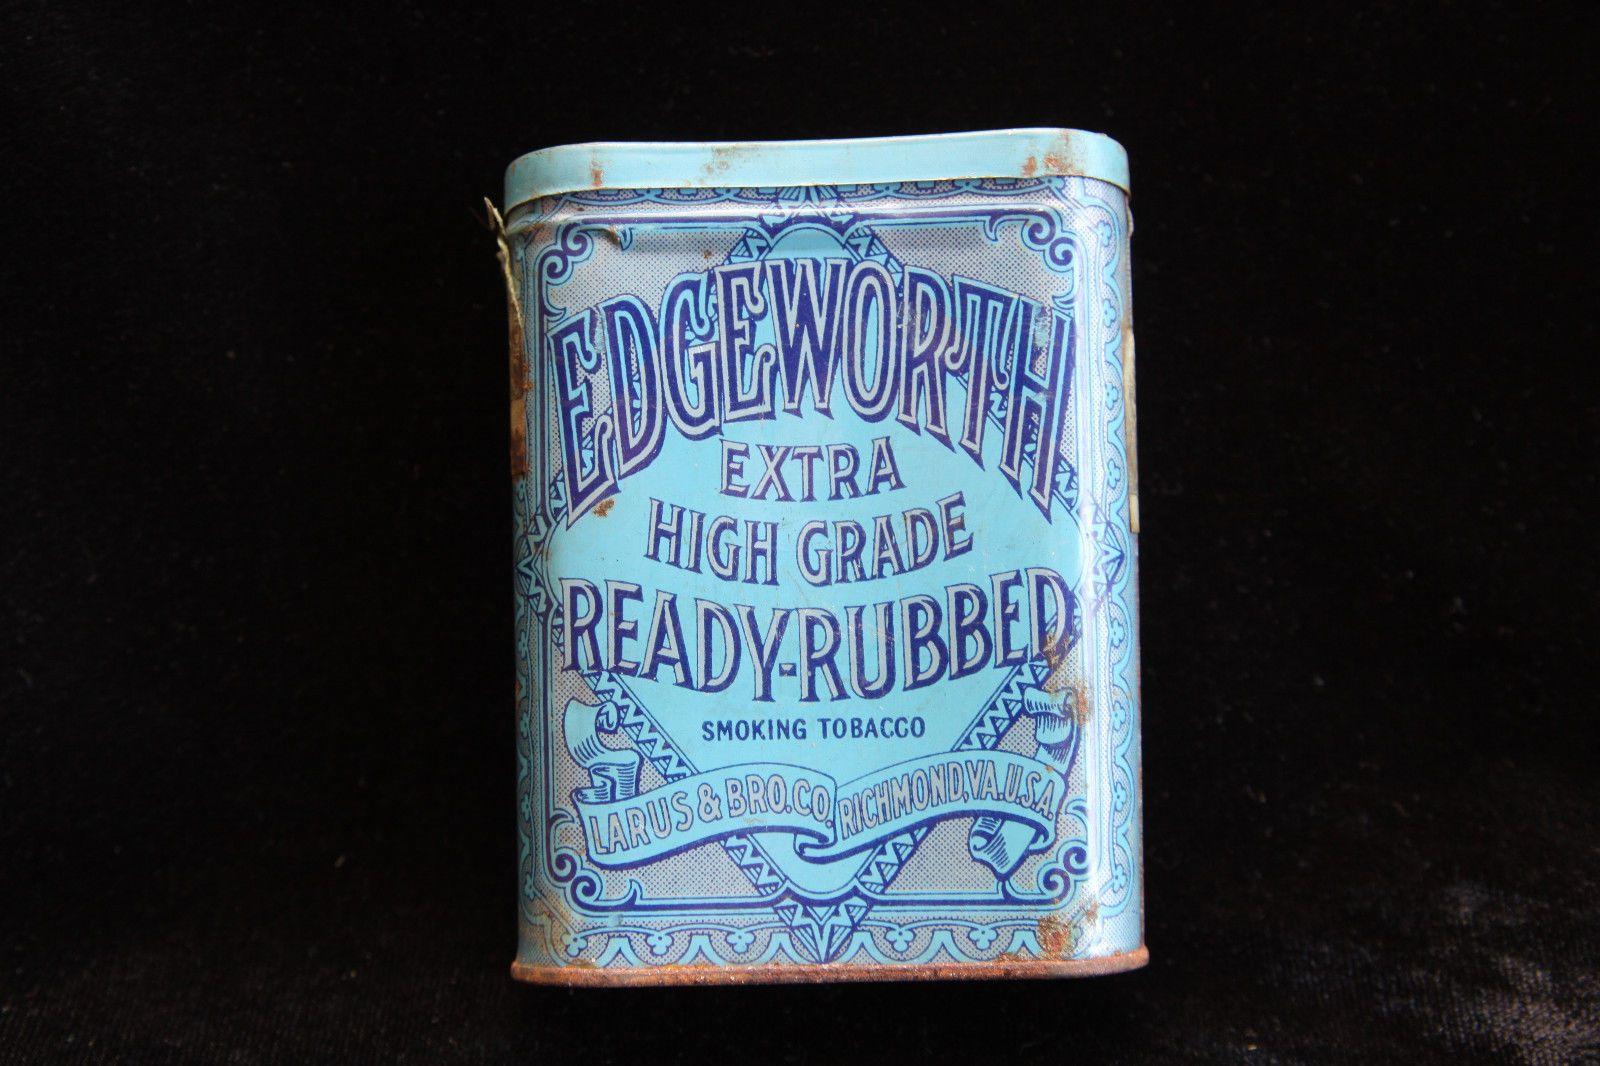 Vintage Tin - Edgeworth Extra High Grade Ready Rubbed Smoking Tobacco Concave | eBay